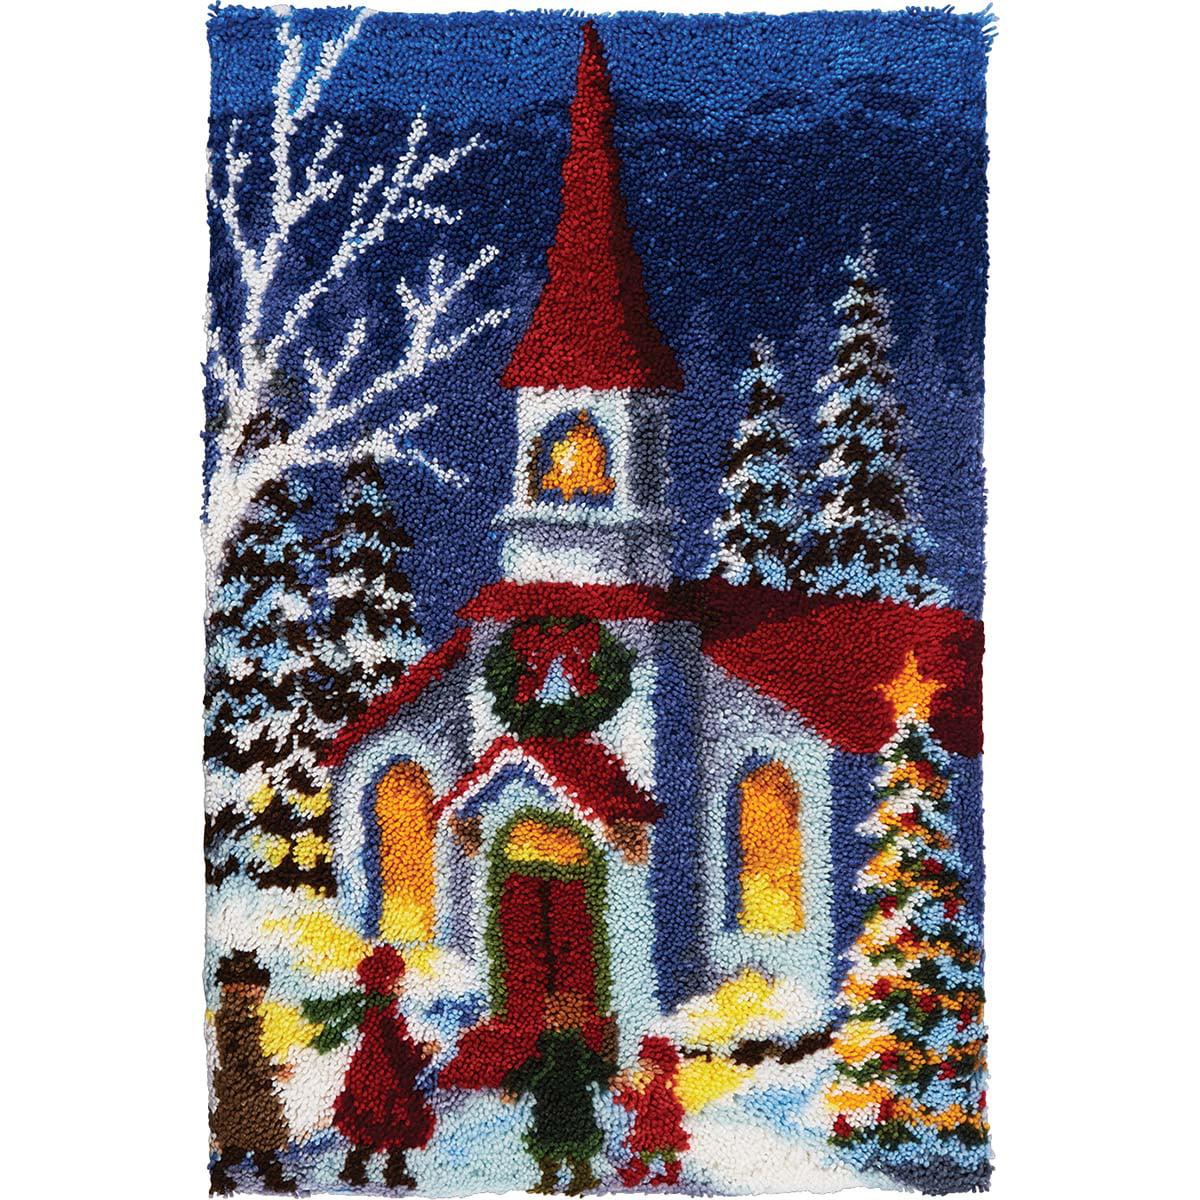 Herrschners® Holiday Church Latch Hook Kit